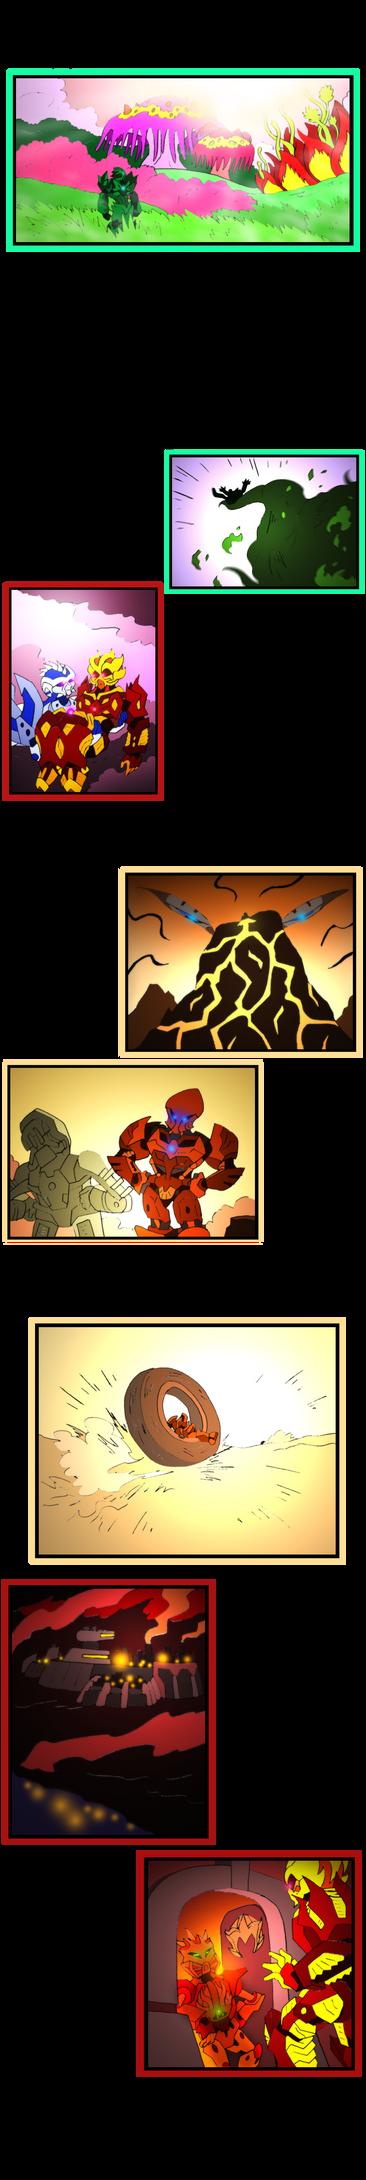 Bionicle- Nova Orbis- Mystery- Chapter 13 by NickinAmerica